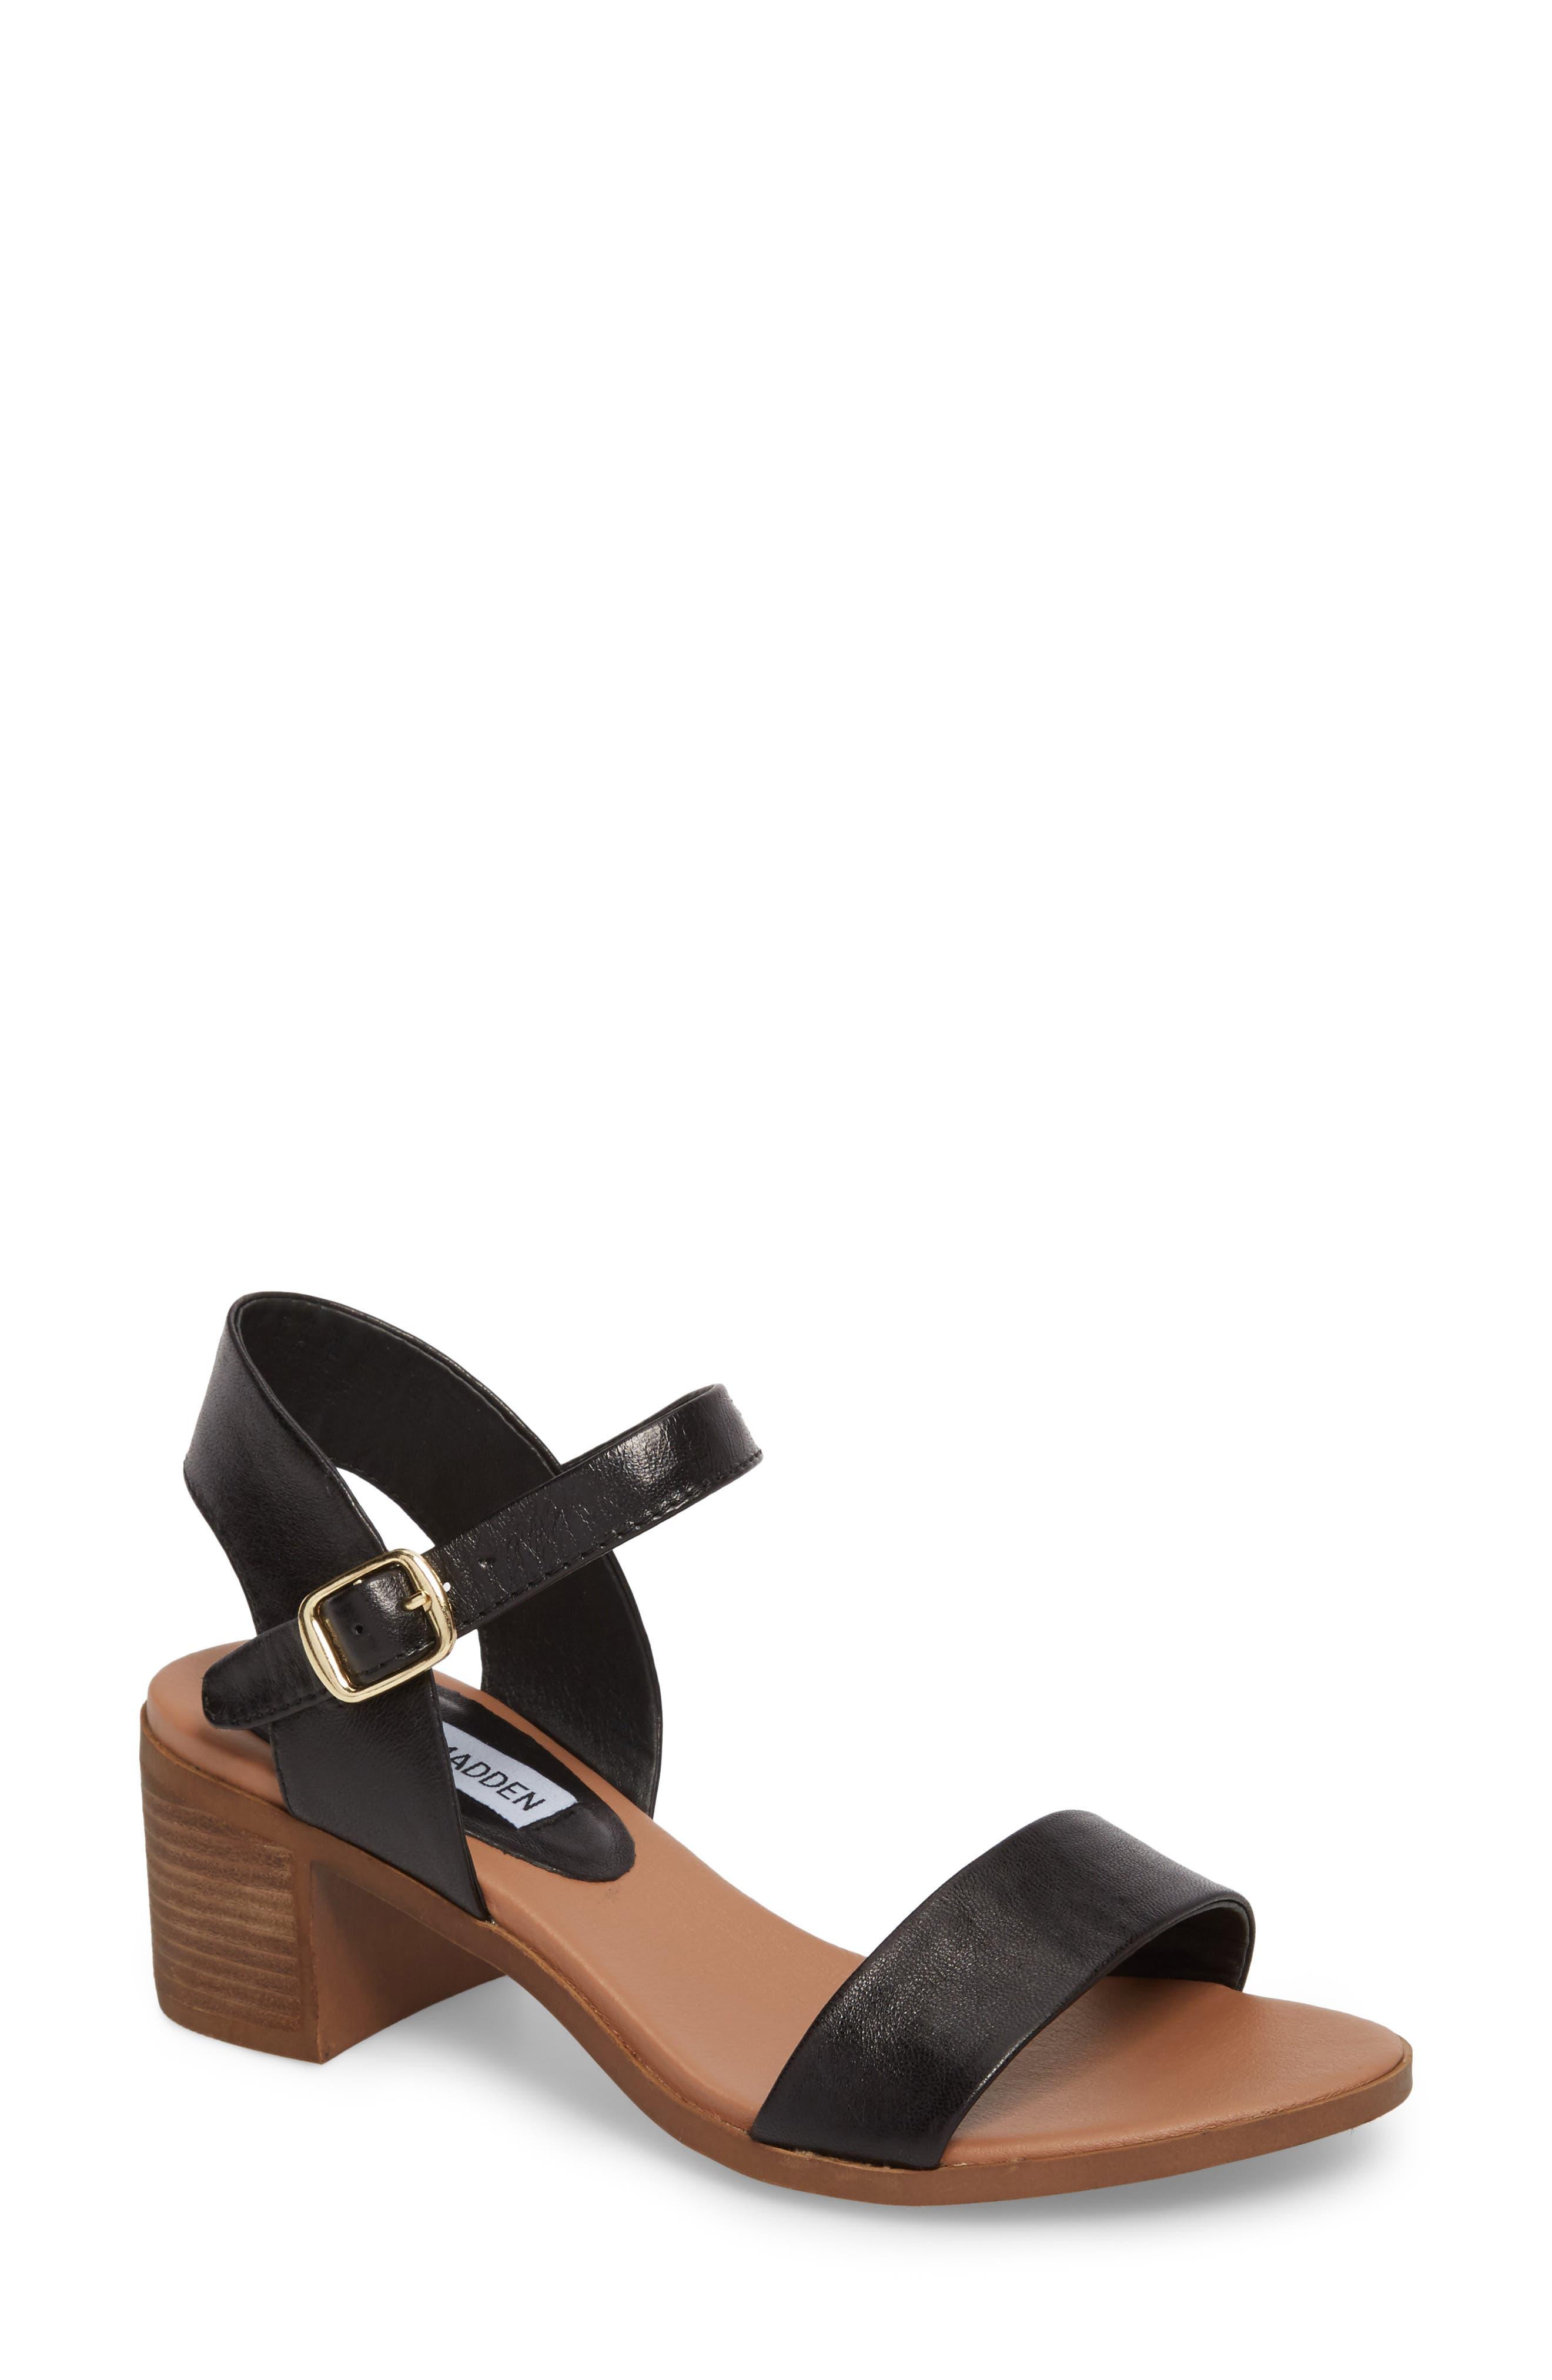 April Block Heel Sandal,                             Main thumbnail 1, color,                             BLACK LEATHER